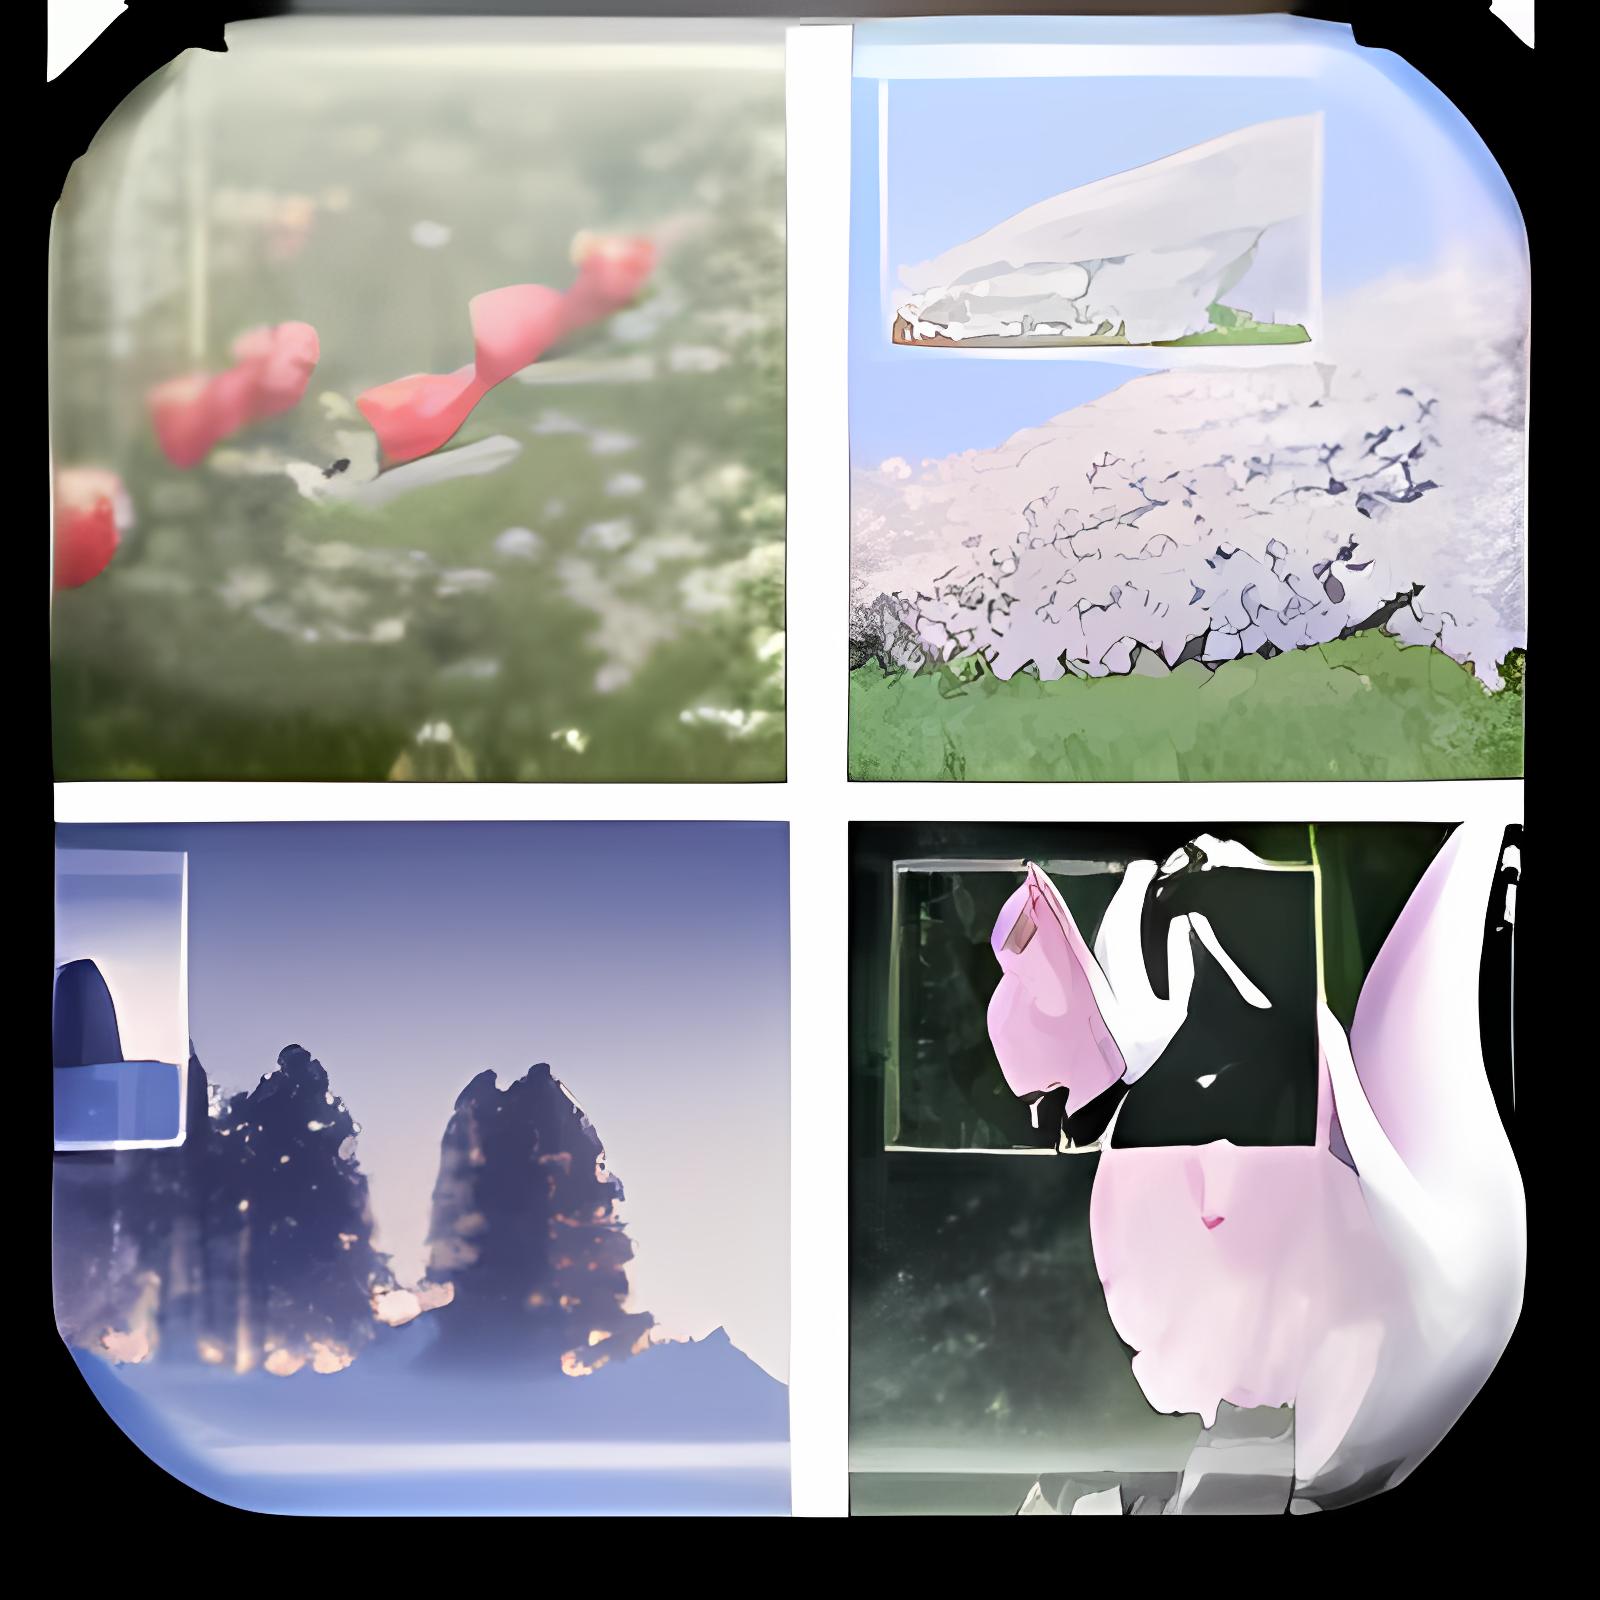 ArcSoft PhotoImpression